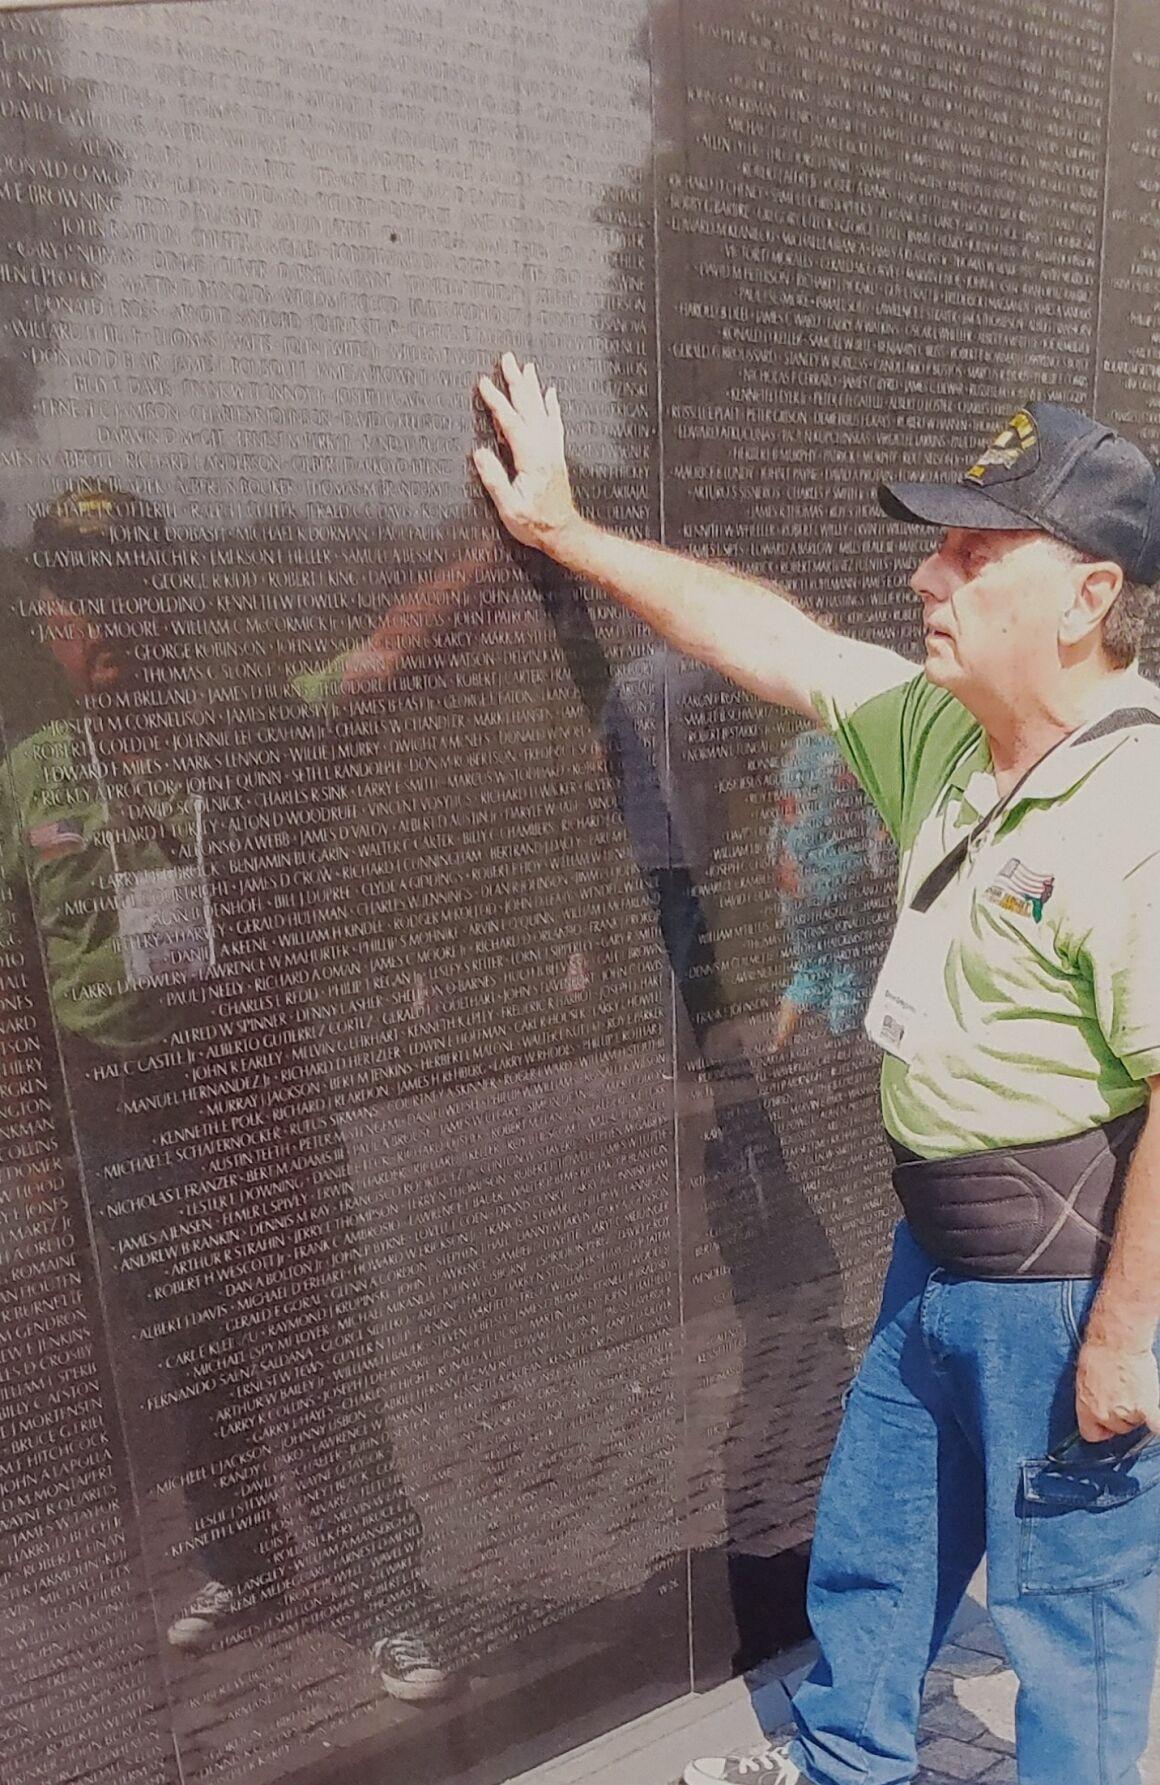 Vietnam veterans describe coming home from war